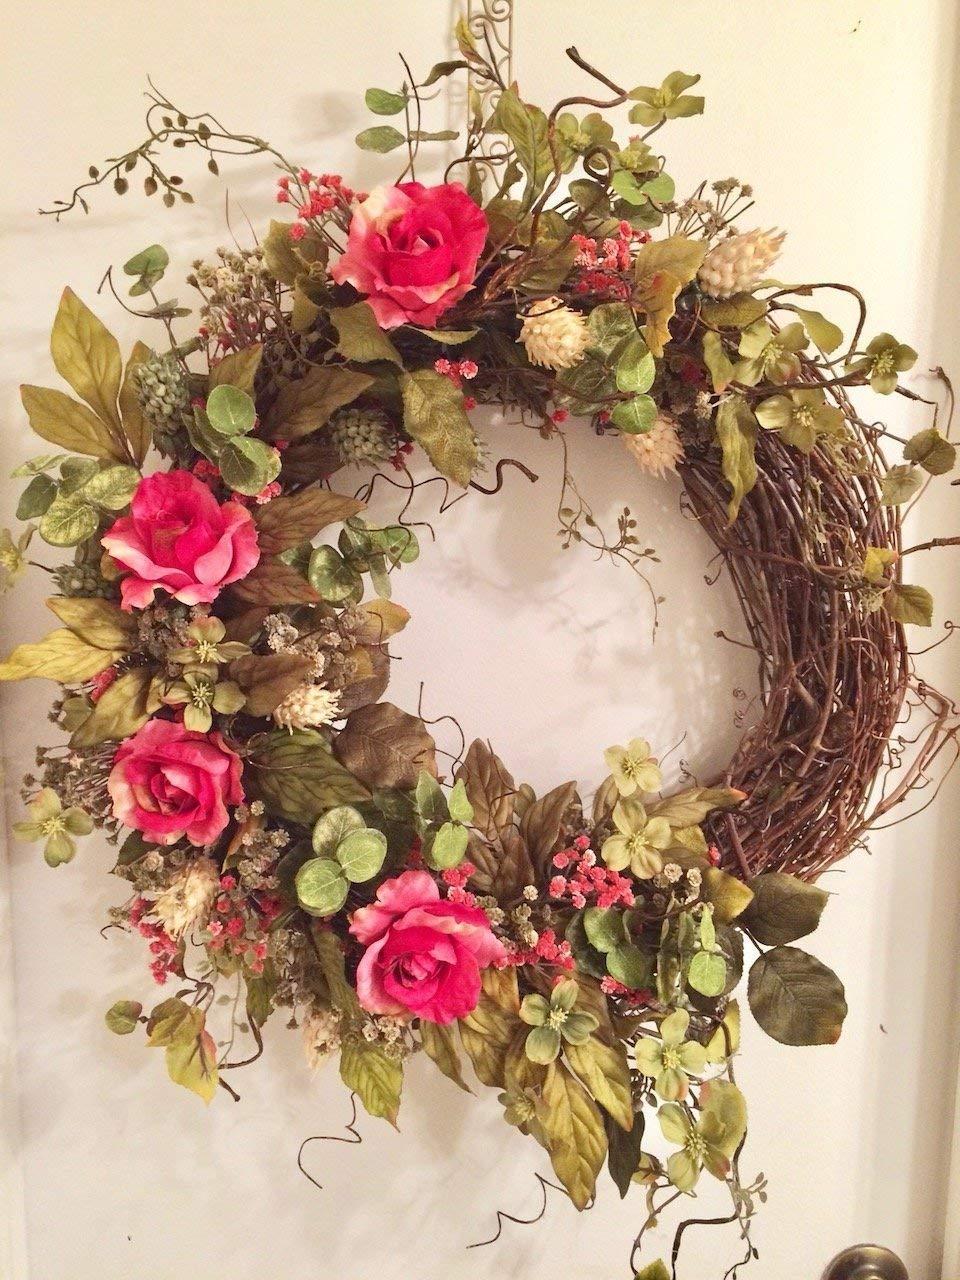 Cheap Foam Rose Wreath Find Foam Rose Wreath Deals On Line At Alibaba Com